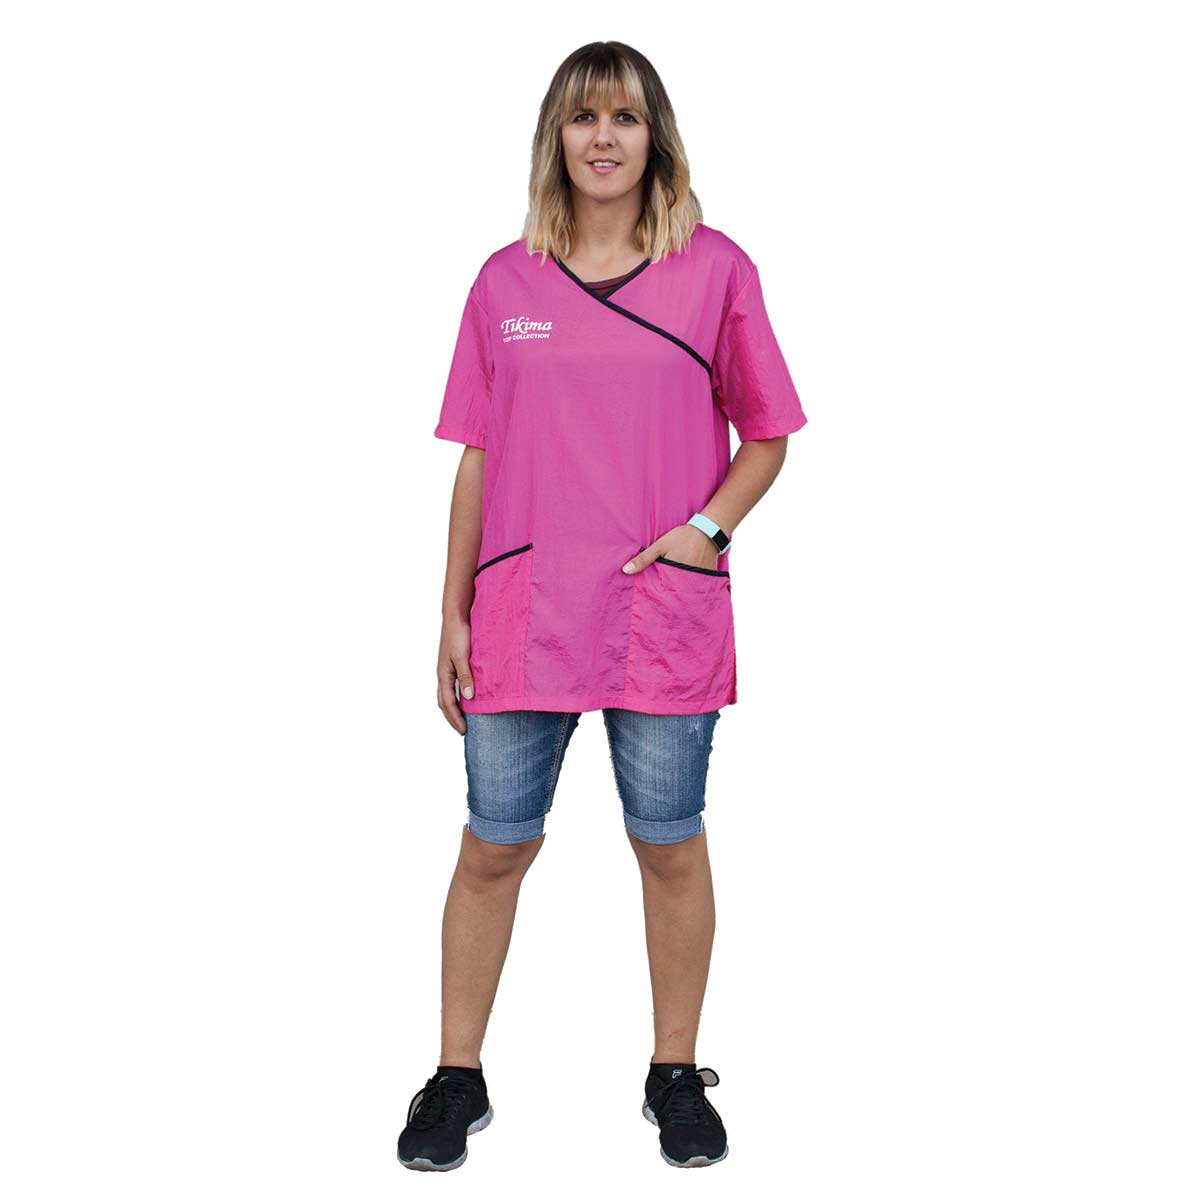 Large Pink Tikima Fiori Grooming Shirt